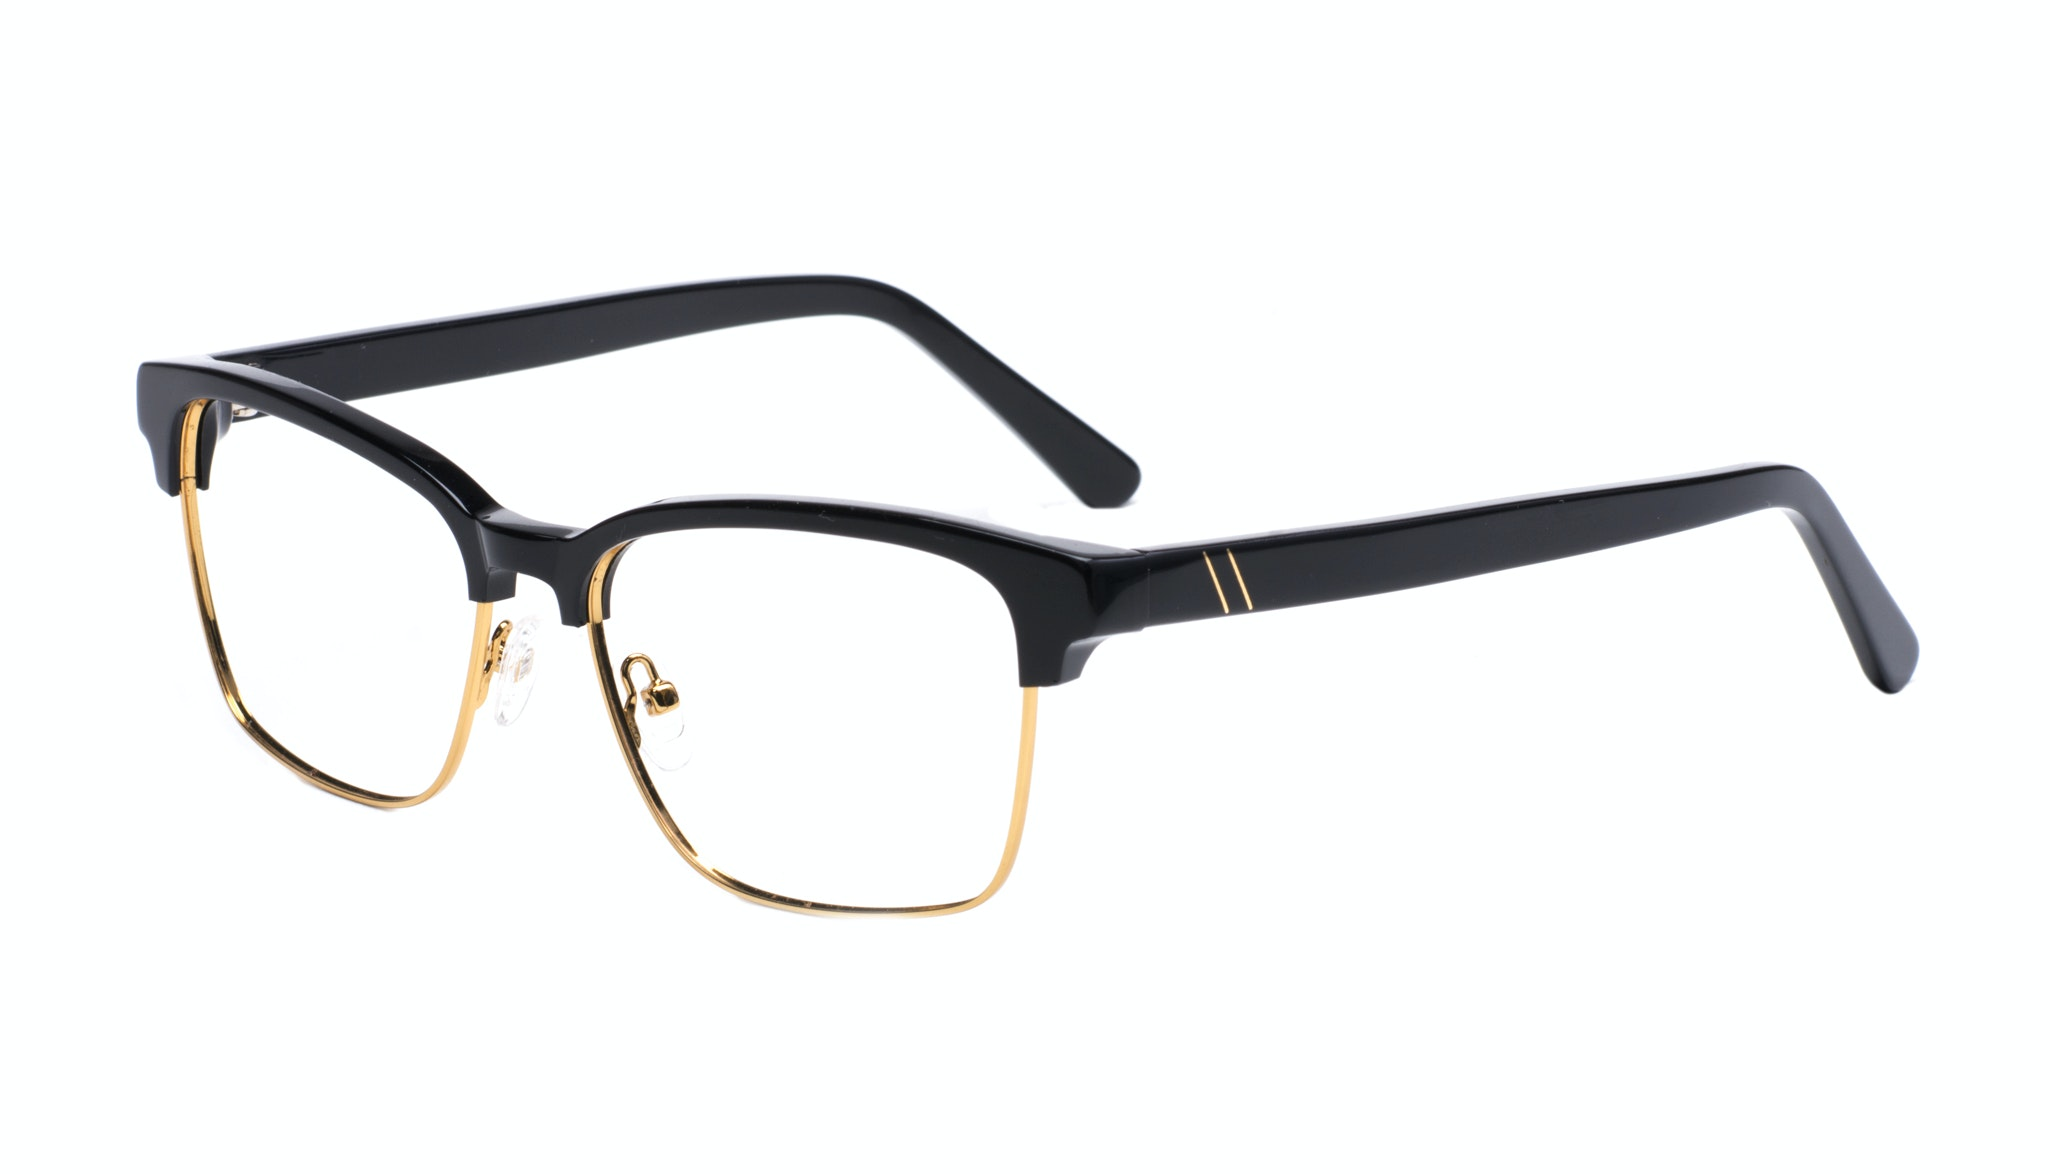 Affordable Fashion Glasses Rectangle Square Eyeglasses Men Gallery Black Tilt